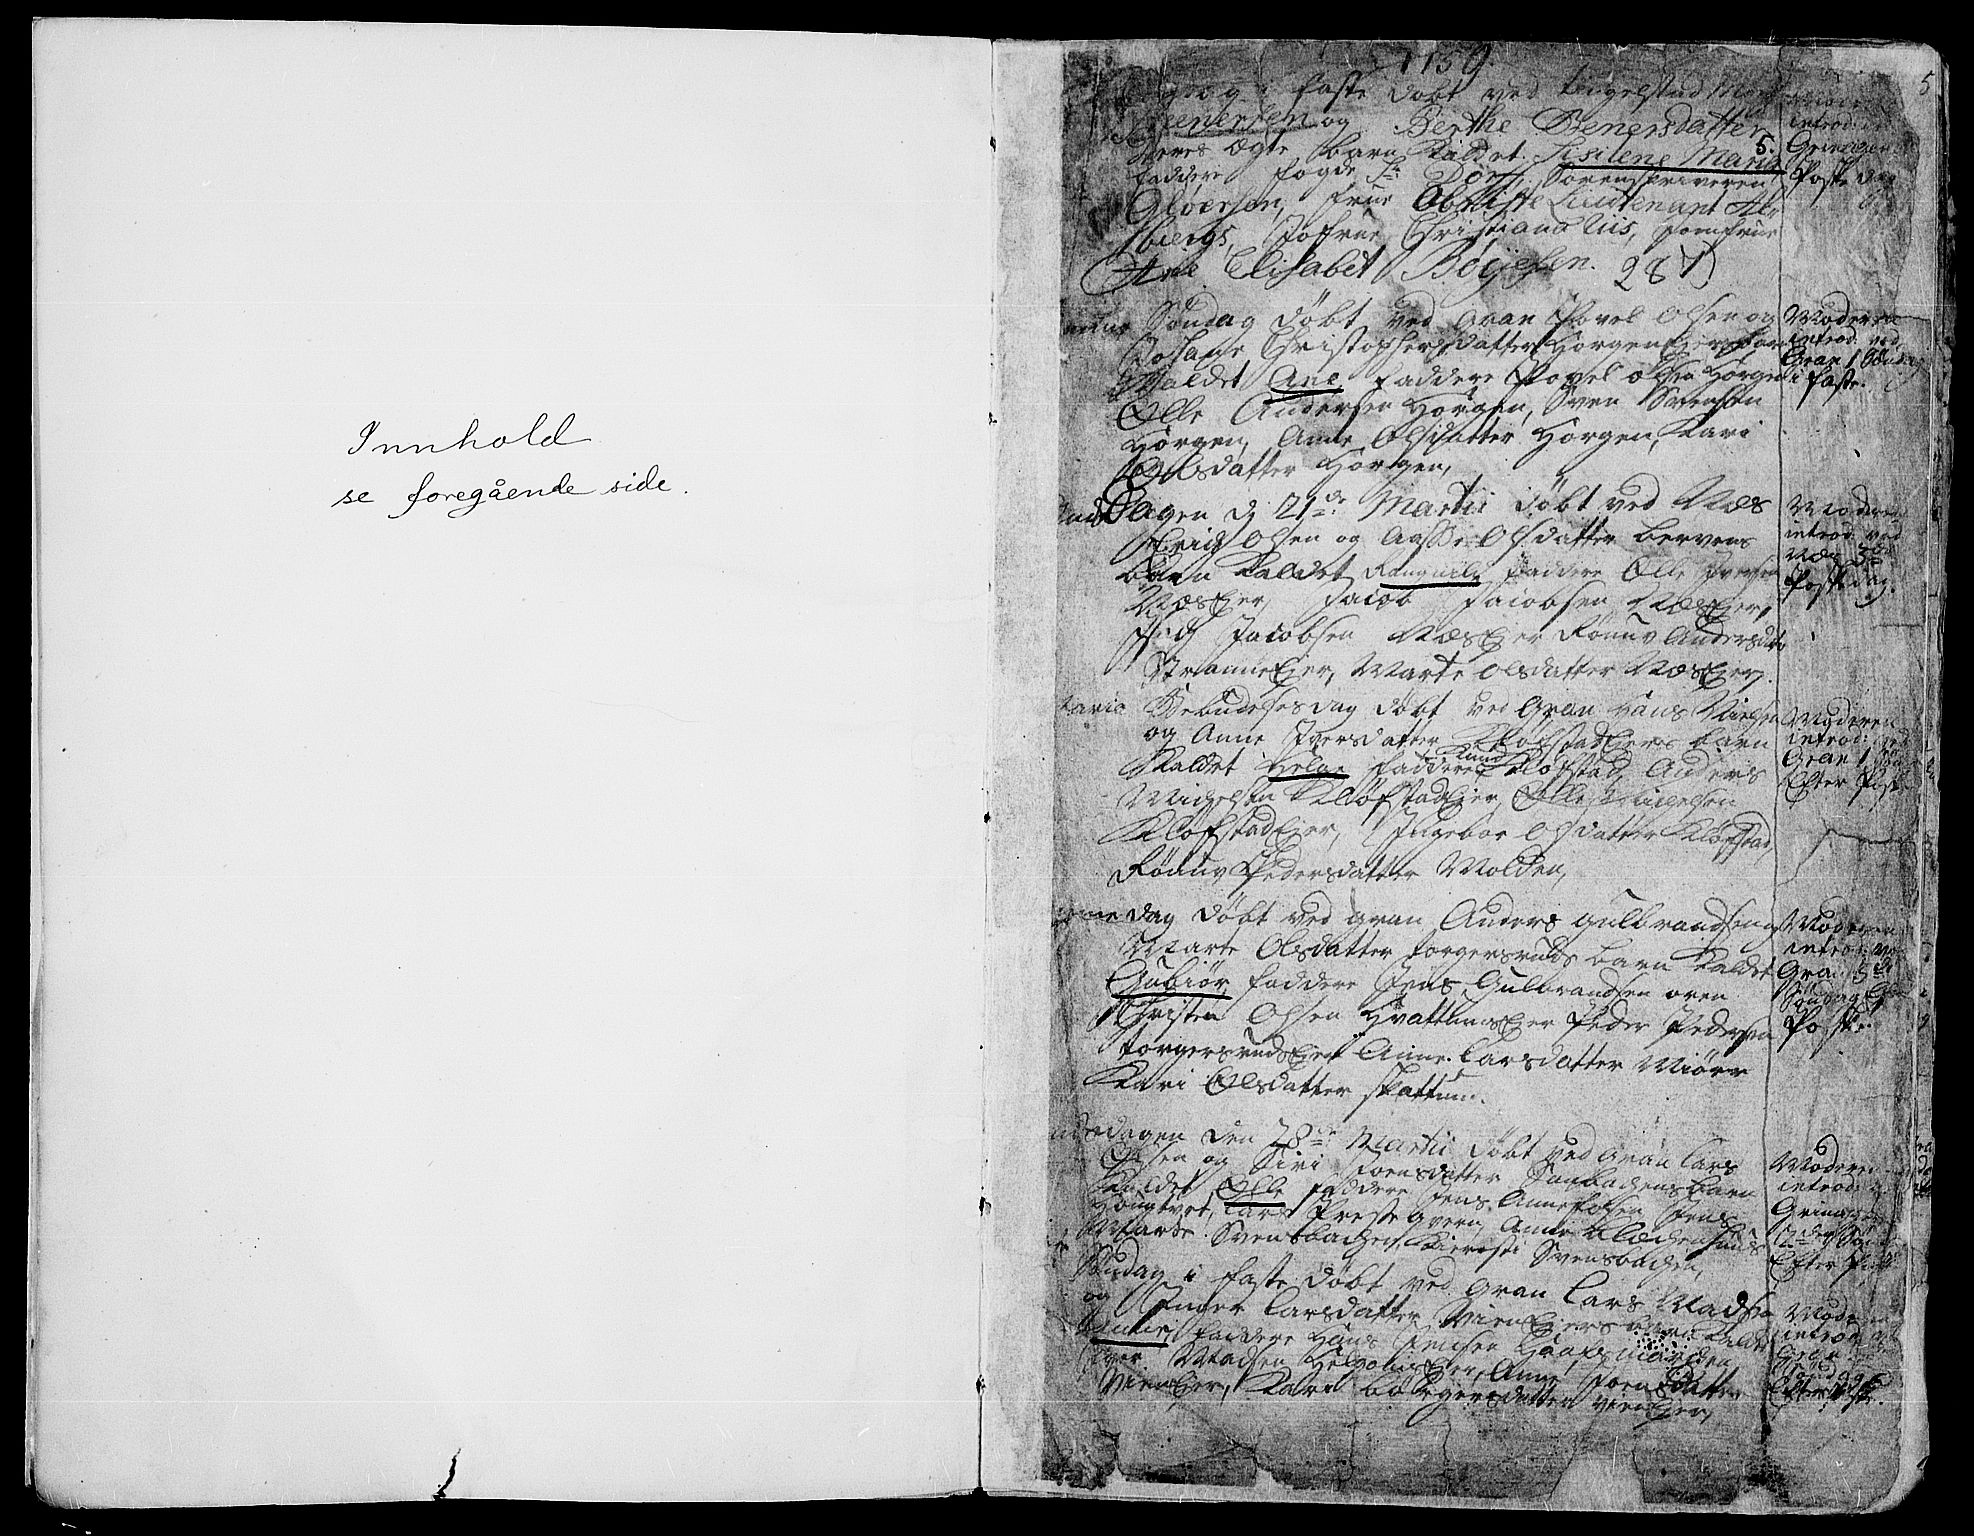 SAH, Gran prestekontor, Ministerialbok nr. 4, 1759-1775, s. 5